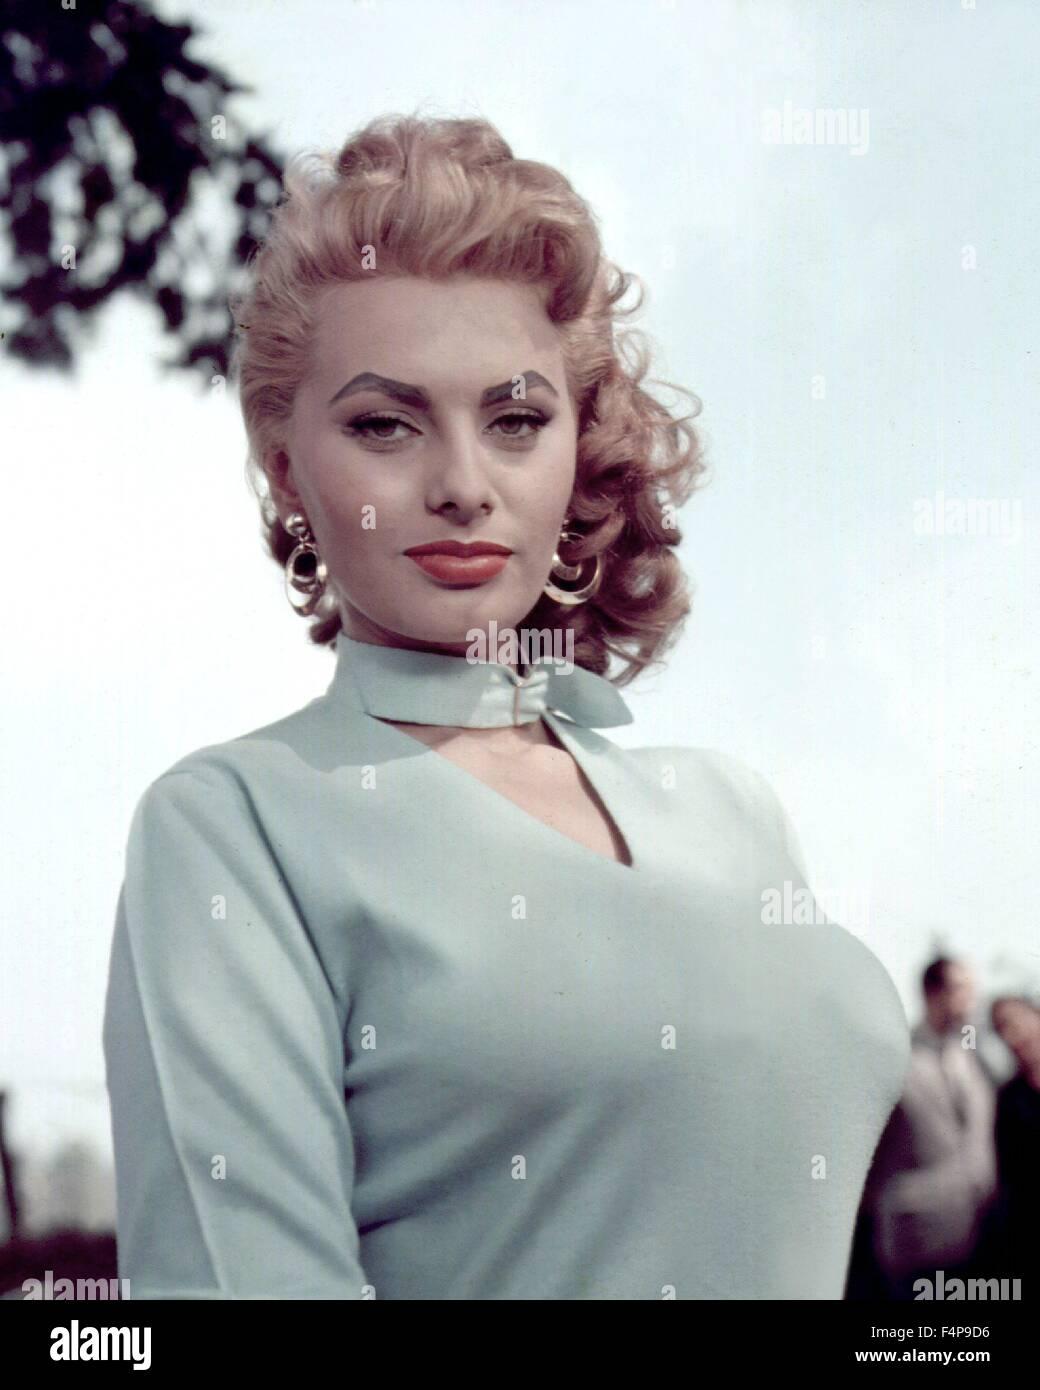 Sophia Loren / Too Bad She's Bad 1954 directed by Alessandro Blasetti - Stock Image